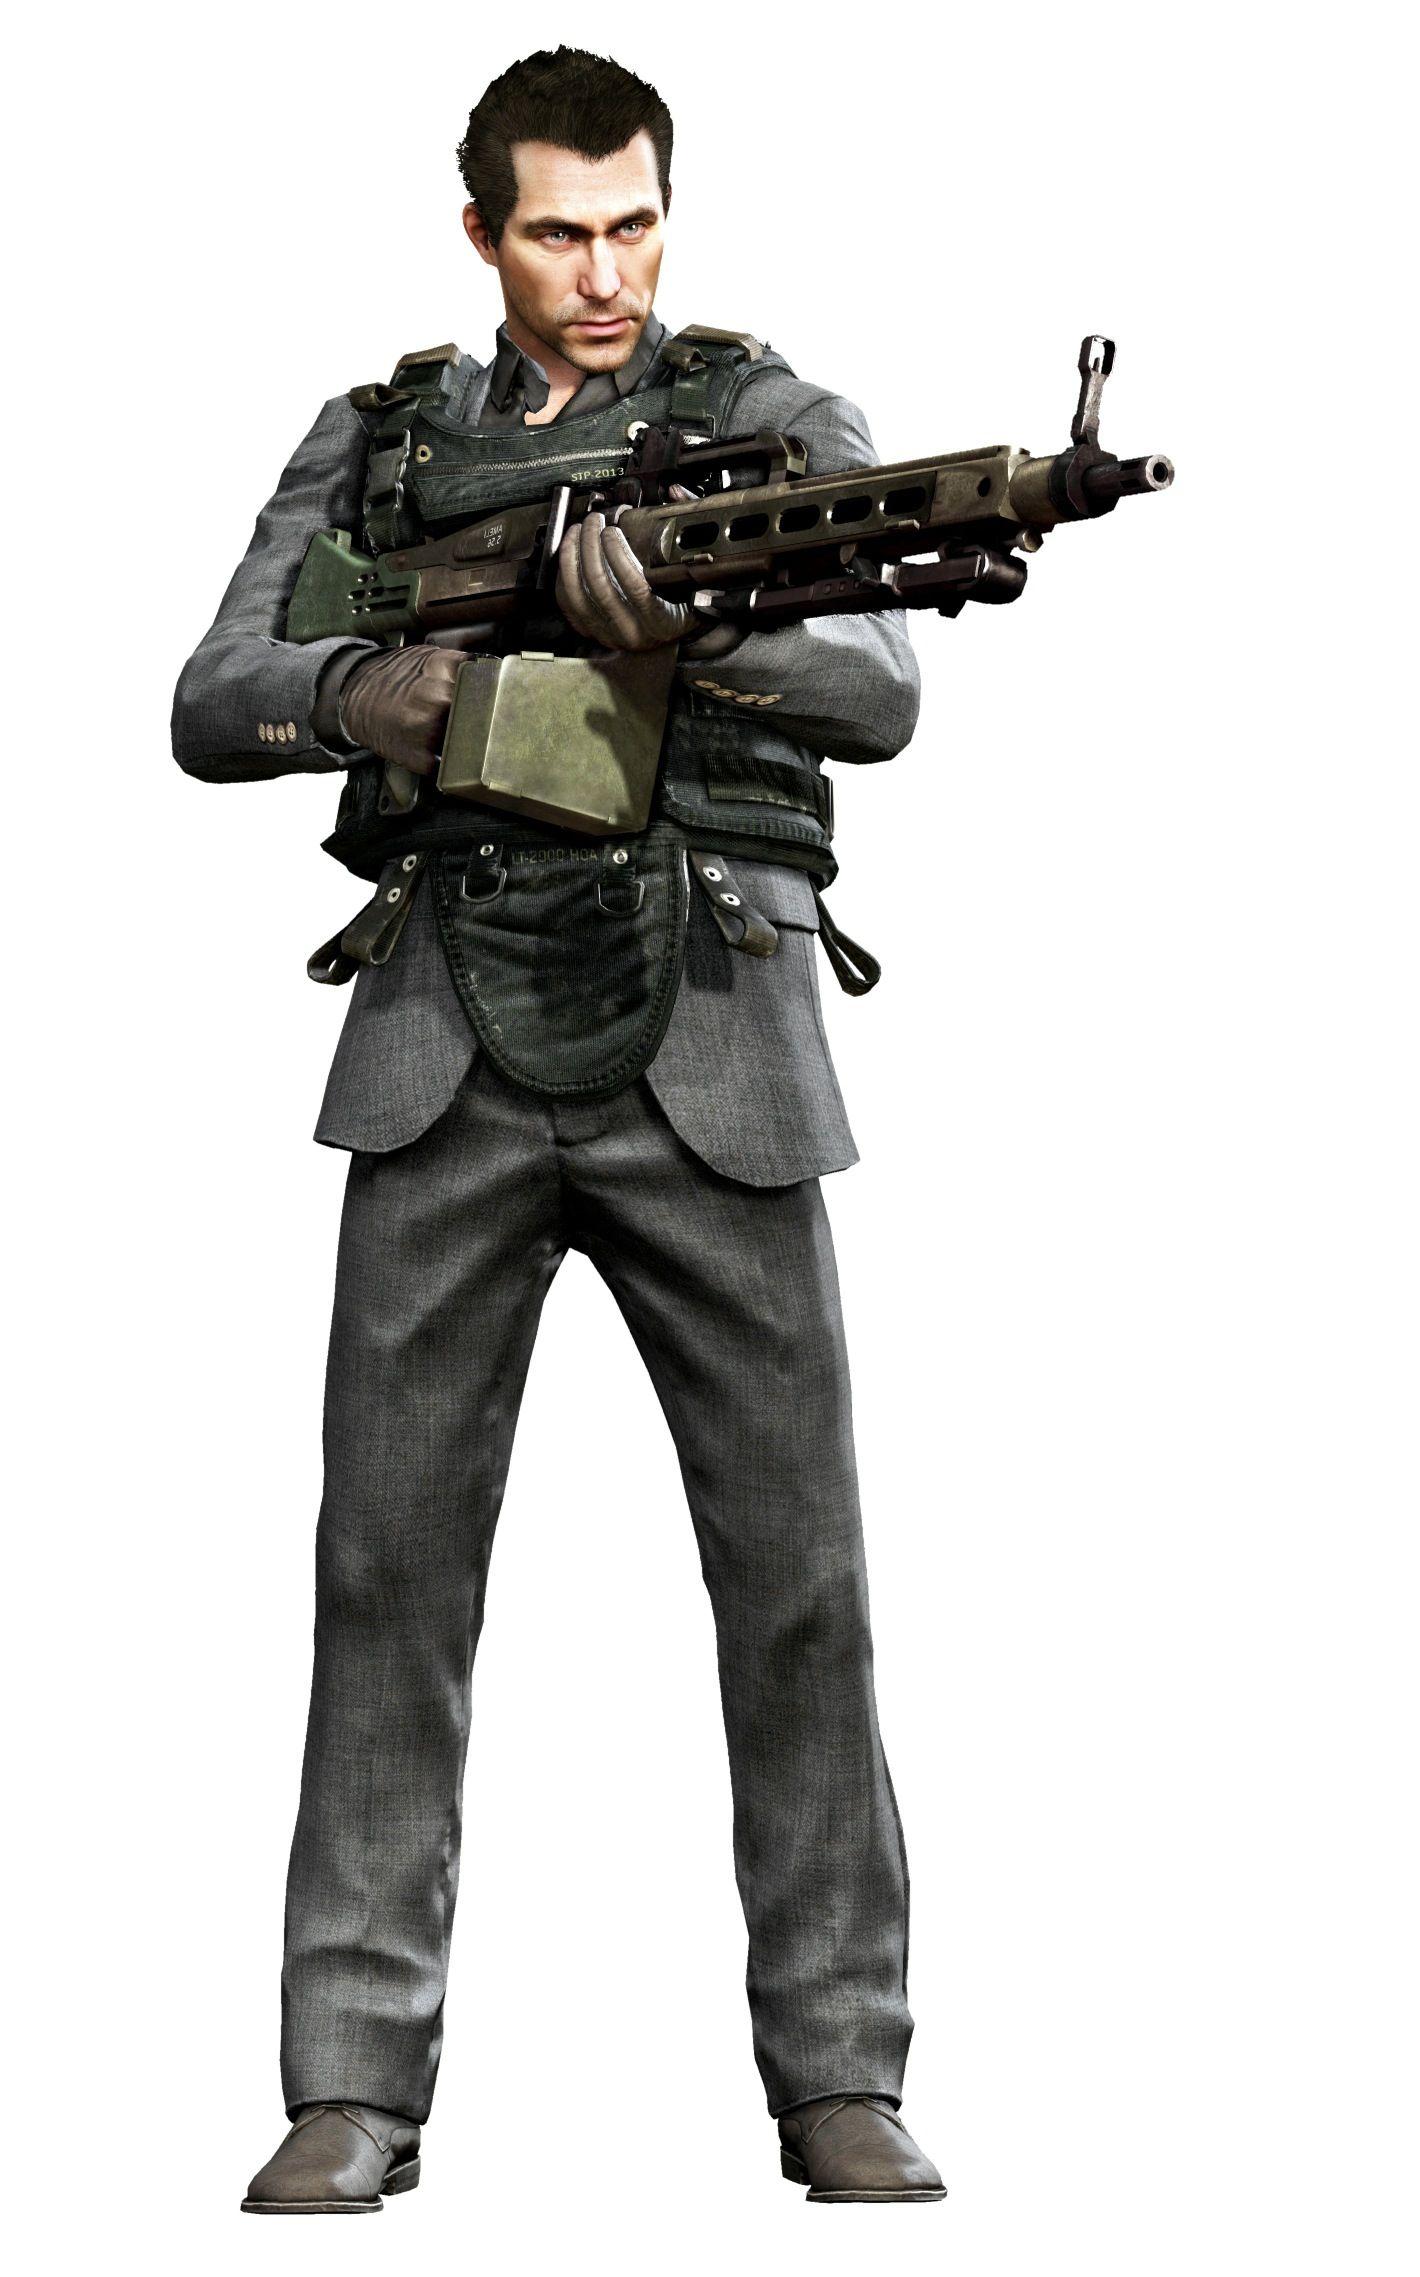 Call Of Duty Mw3 C Activision Infinity Ward Jake Rowell Marketing Image Oscar Lopez Character Call Of Duty Call Of Duty Zombies Modern Warfare